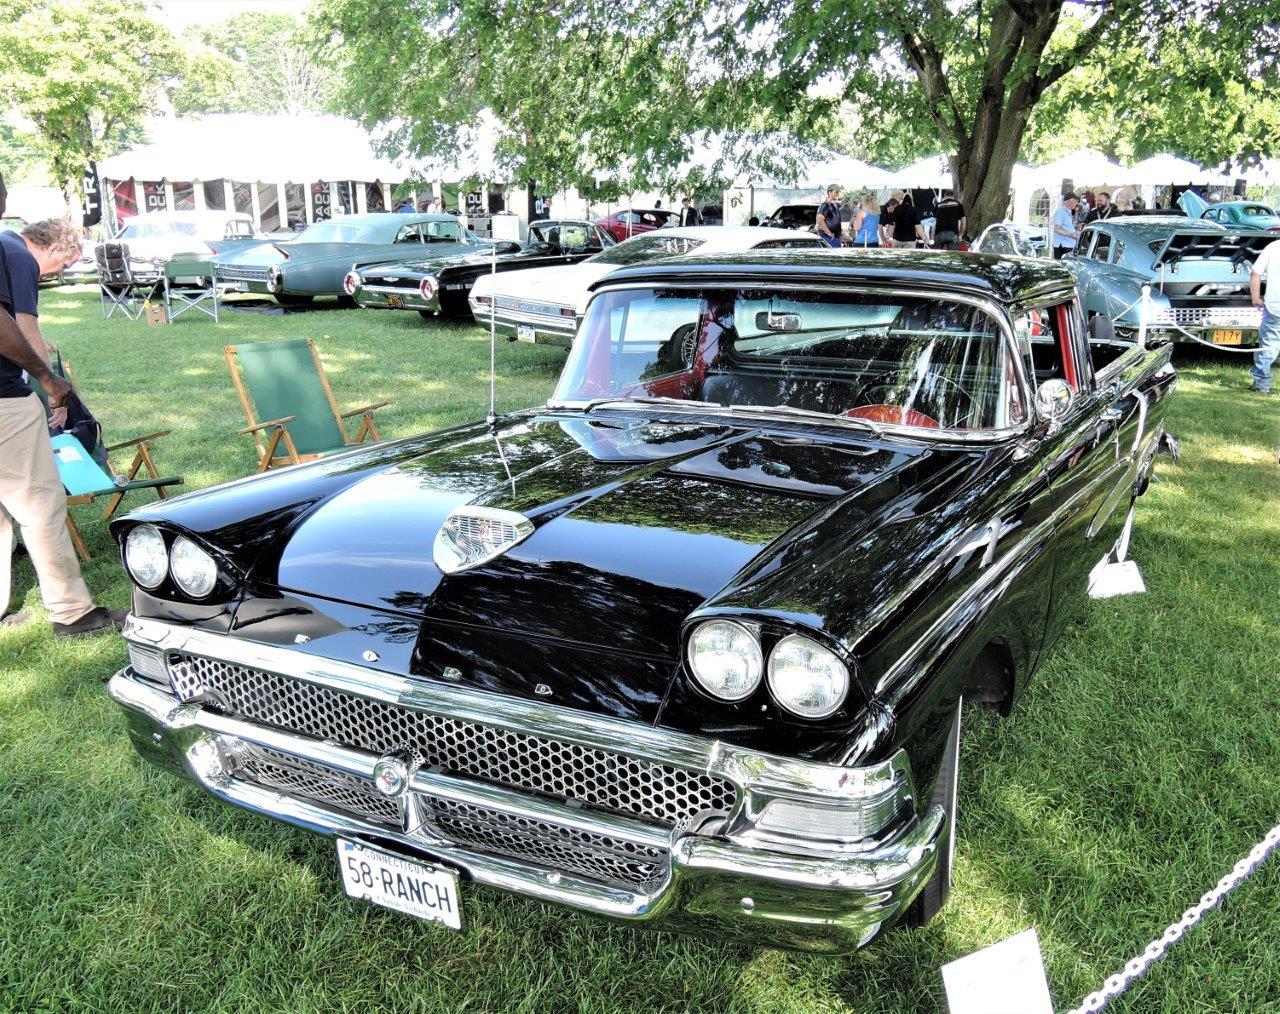 black 1958 Ford Ranchero - 2018 Greenwich Concours Americana